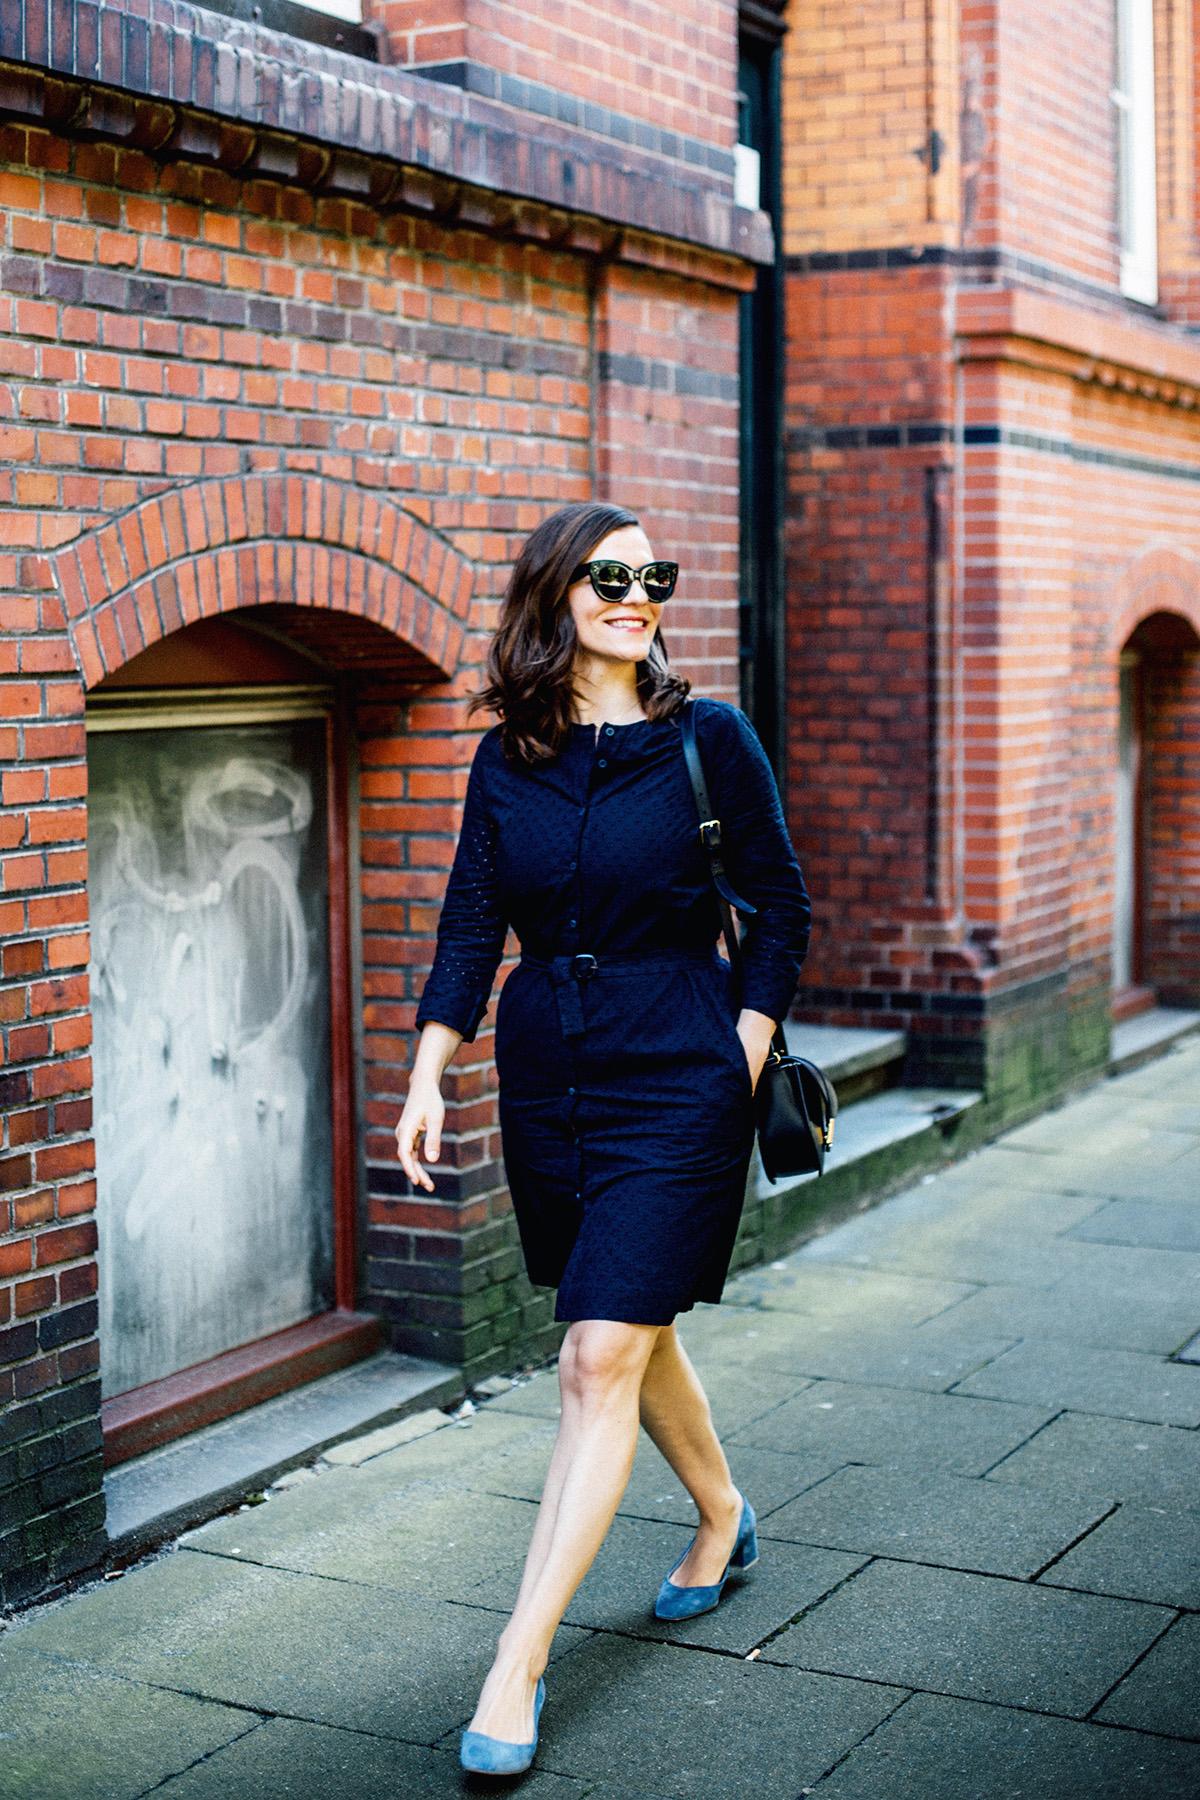 Foxycheeks / Outfit Beautyblogger / Yelda Yilmaz